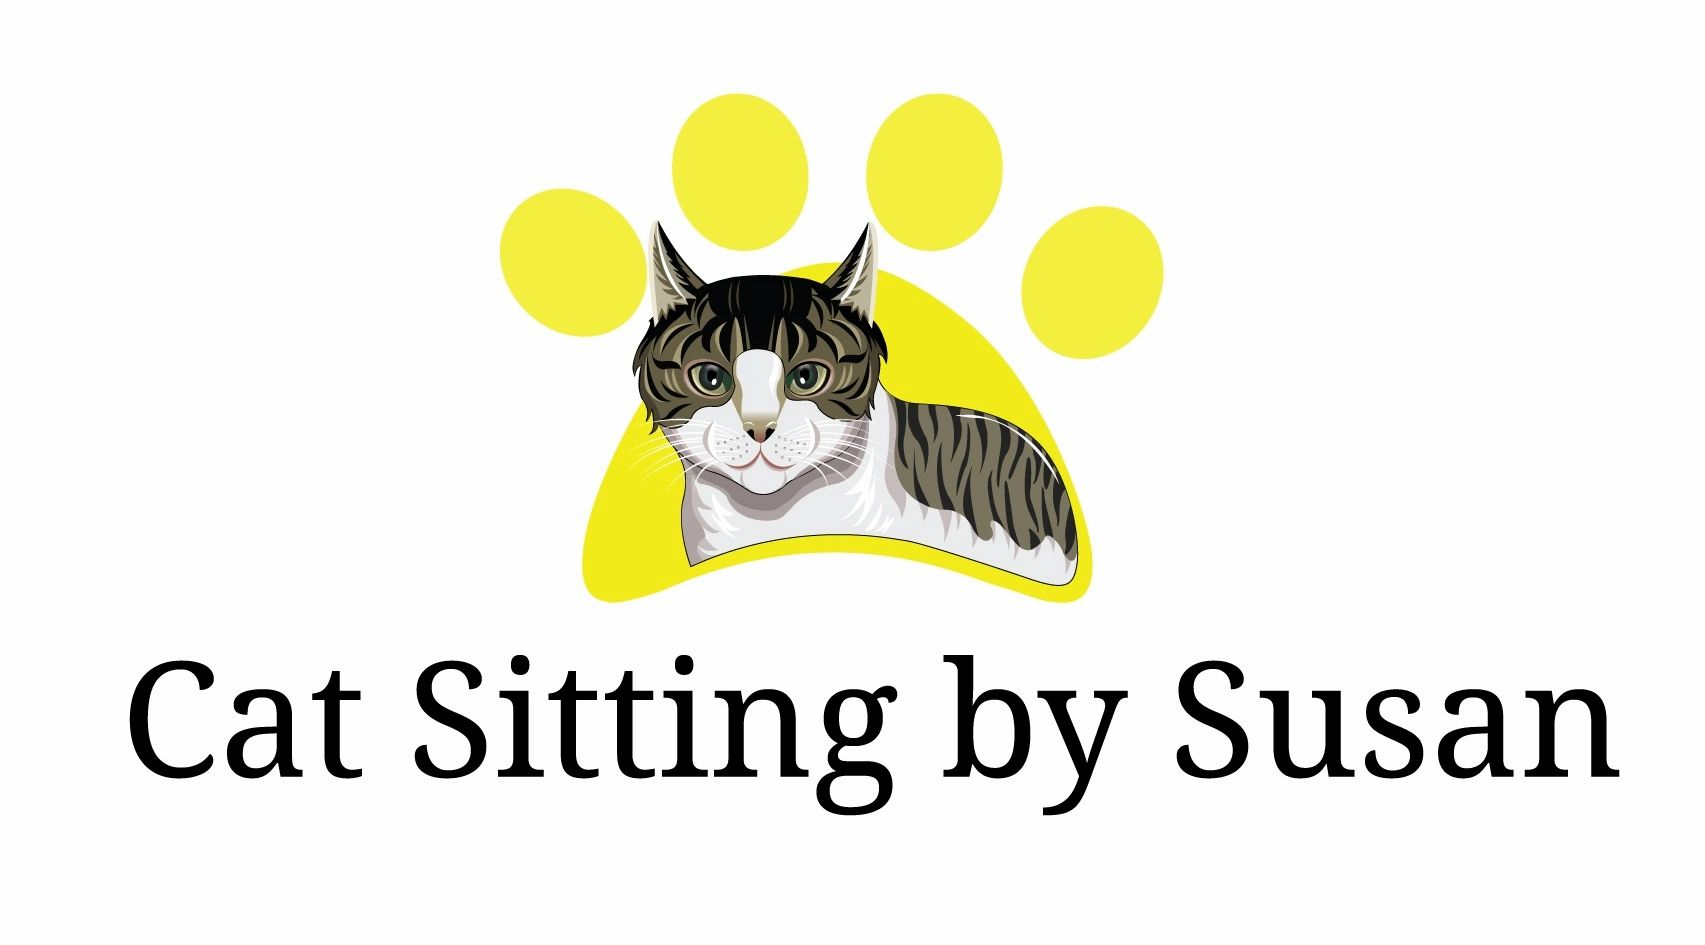 Cat Sitting by Susan Home | Cat Sitting by Susan